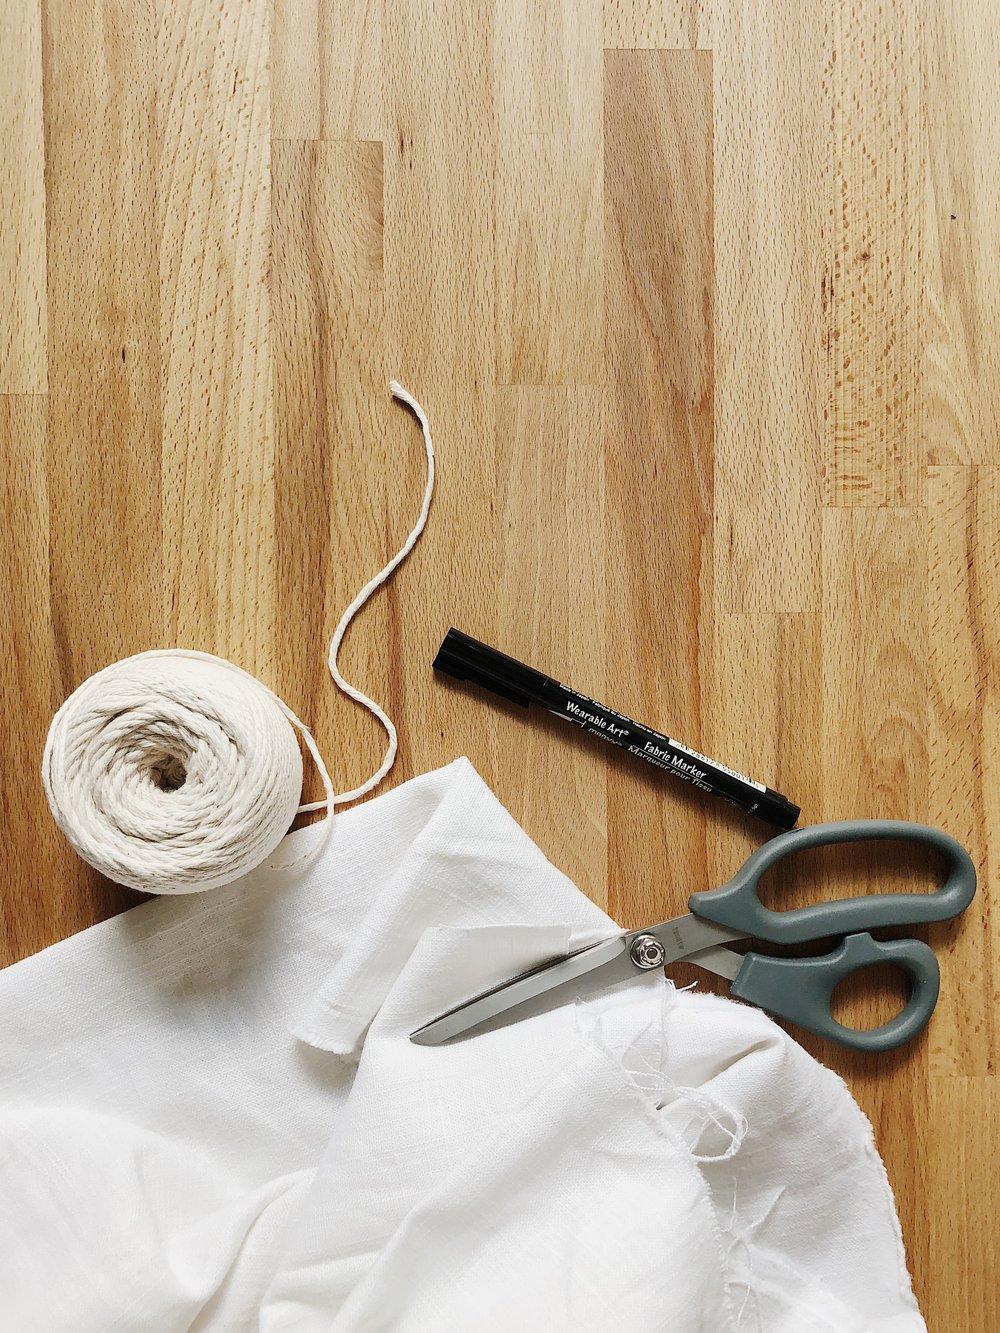 DIY HAND LETTERED LINEN GIFT WRAP TUTORIAL